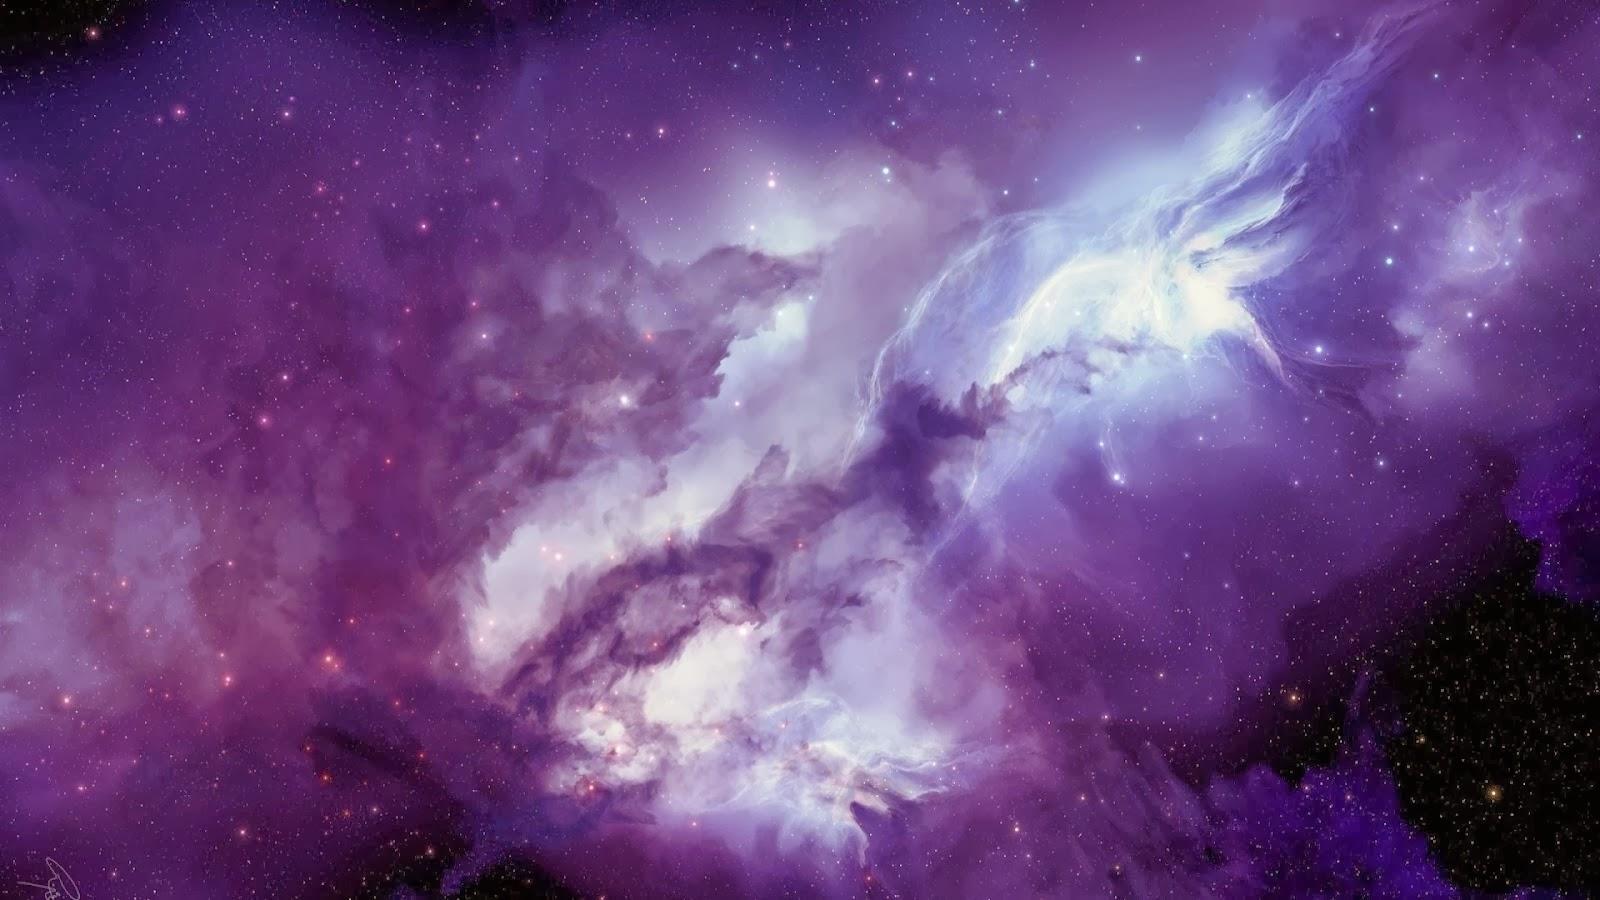 way galaxy hd wallpapers 1080p space milky way galaxy hd wallpapers 1600x900